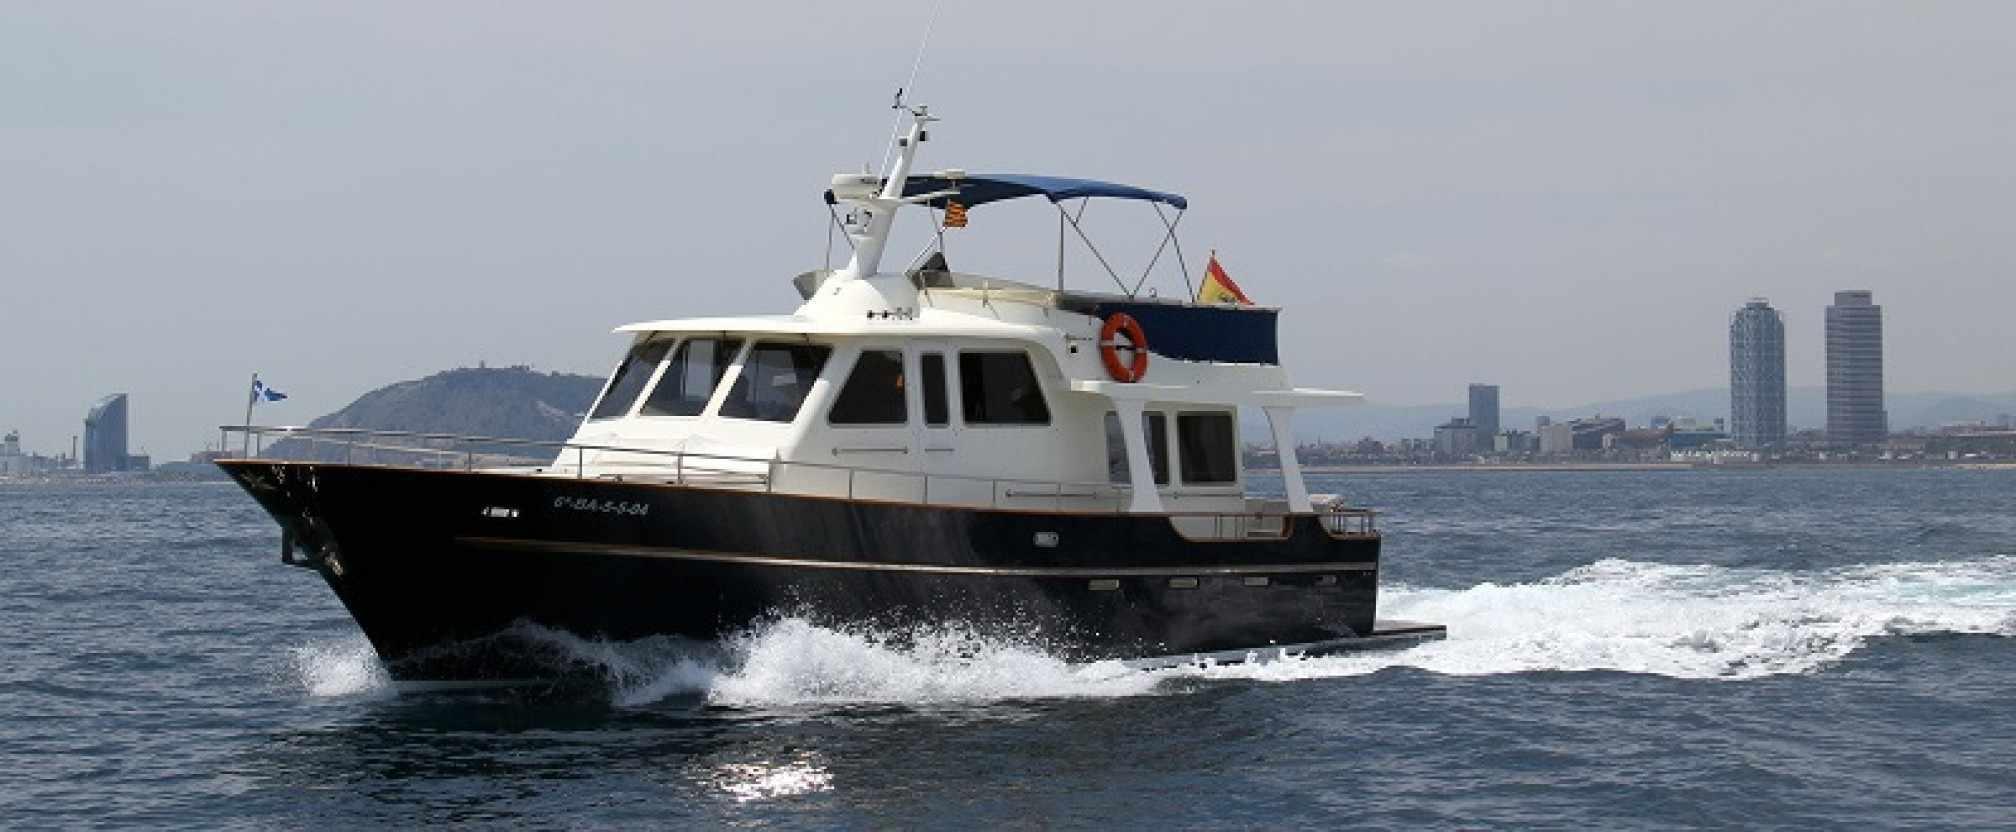 Belliure 48 'Ismar' yacht charter sailing